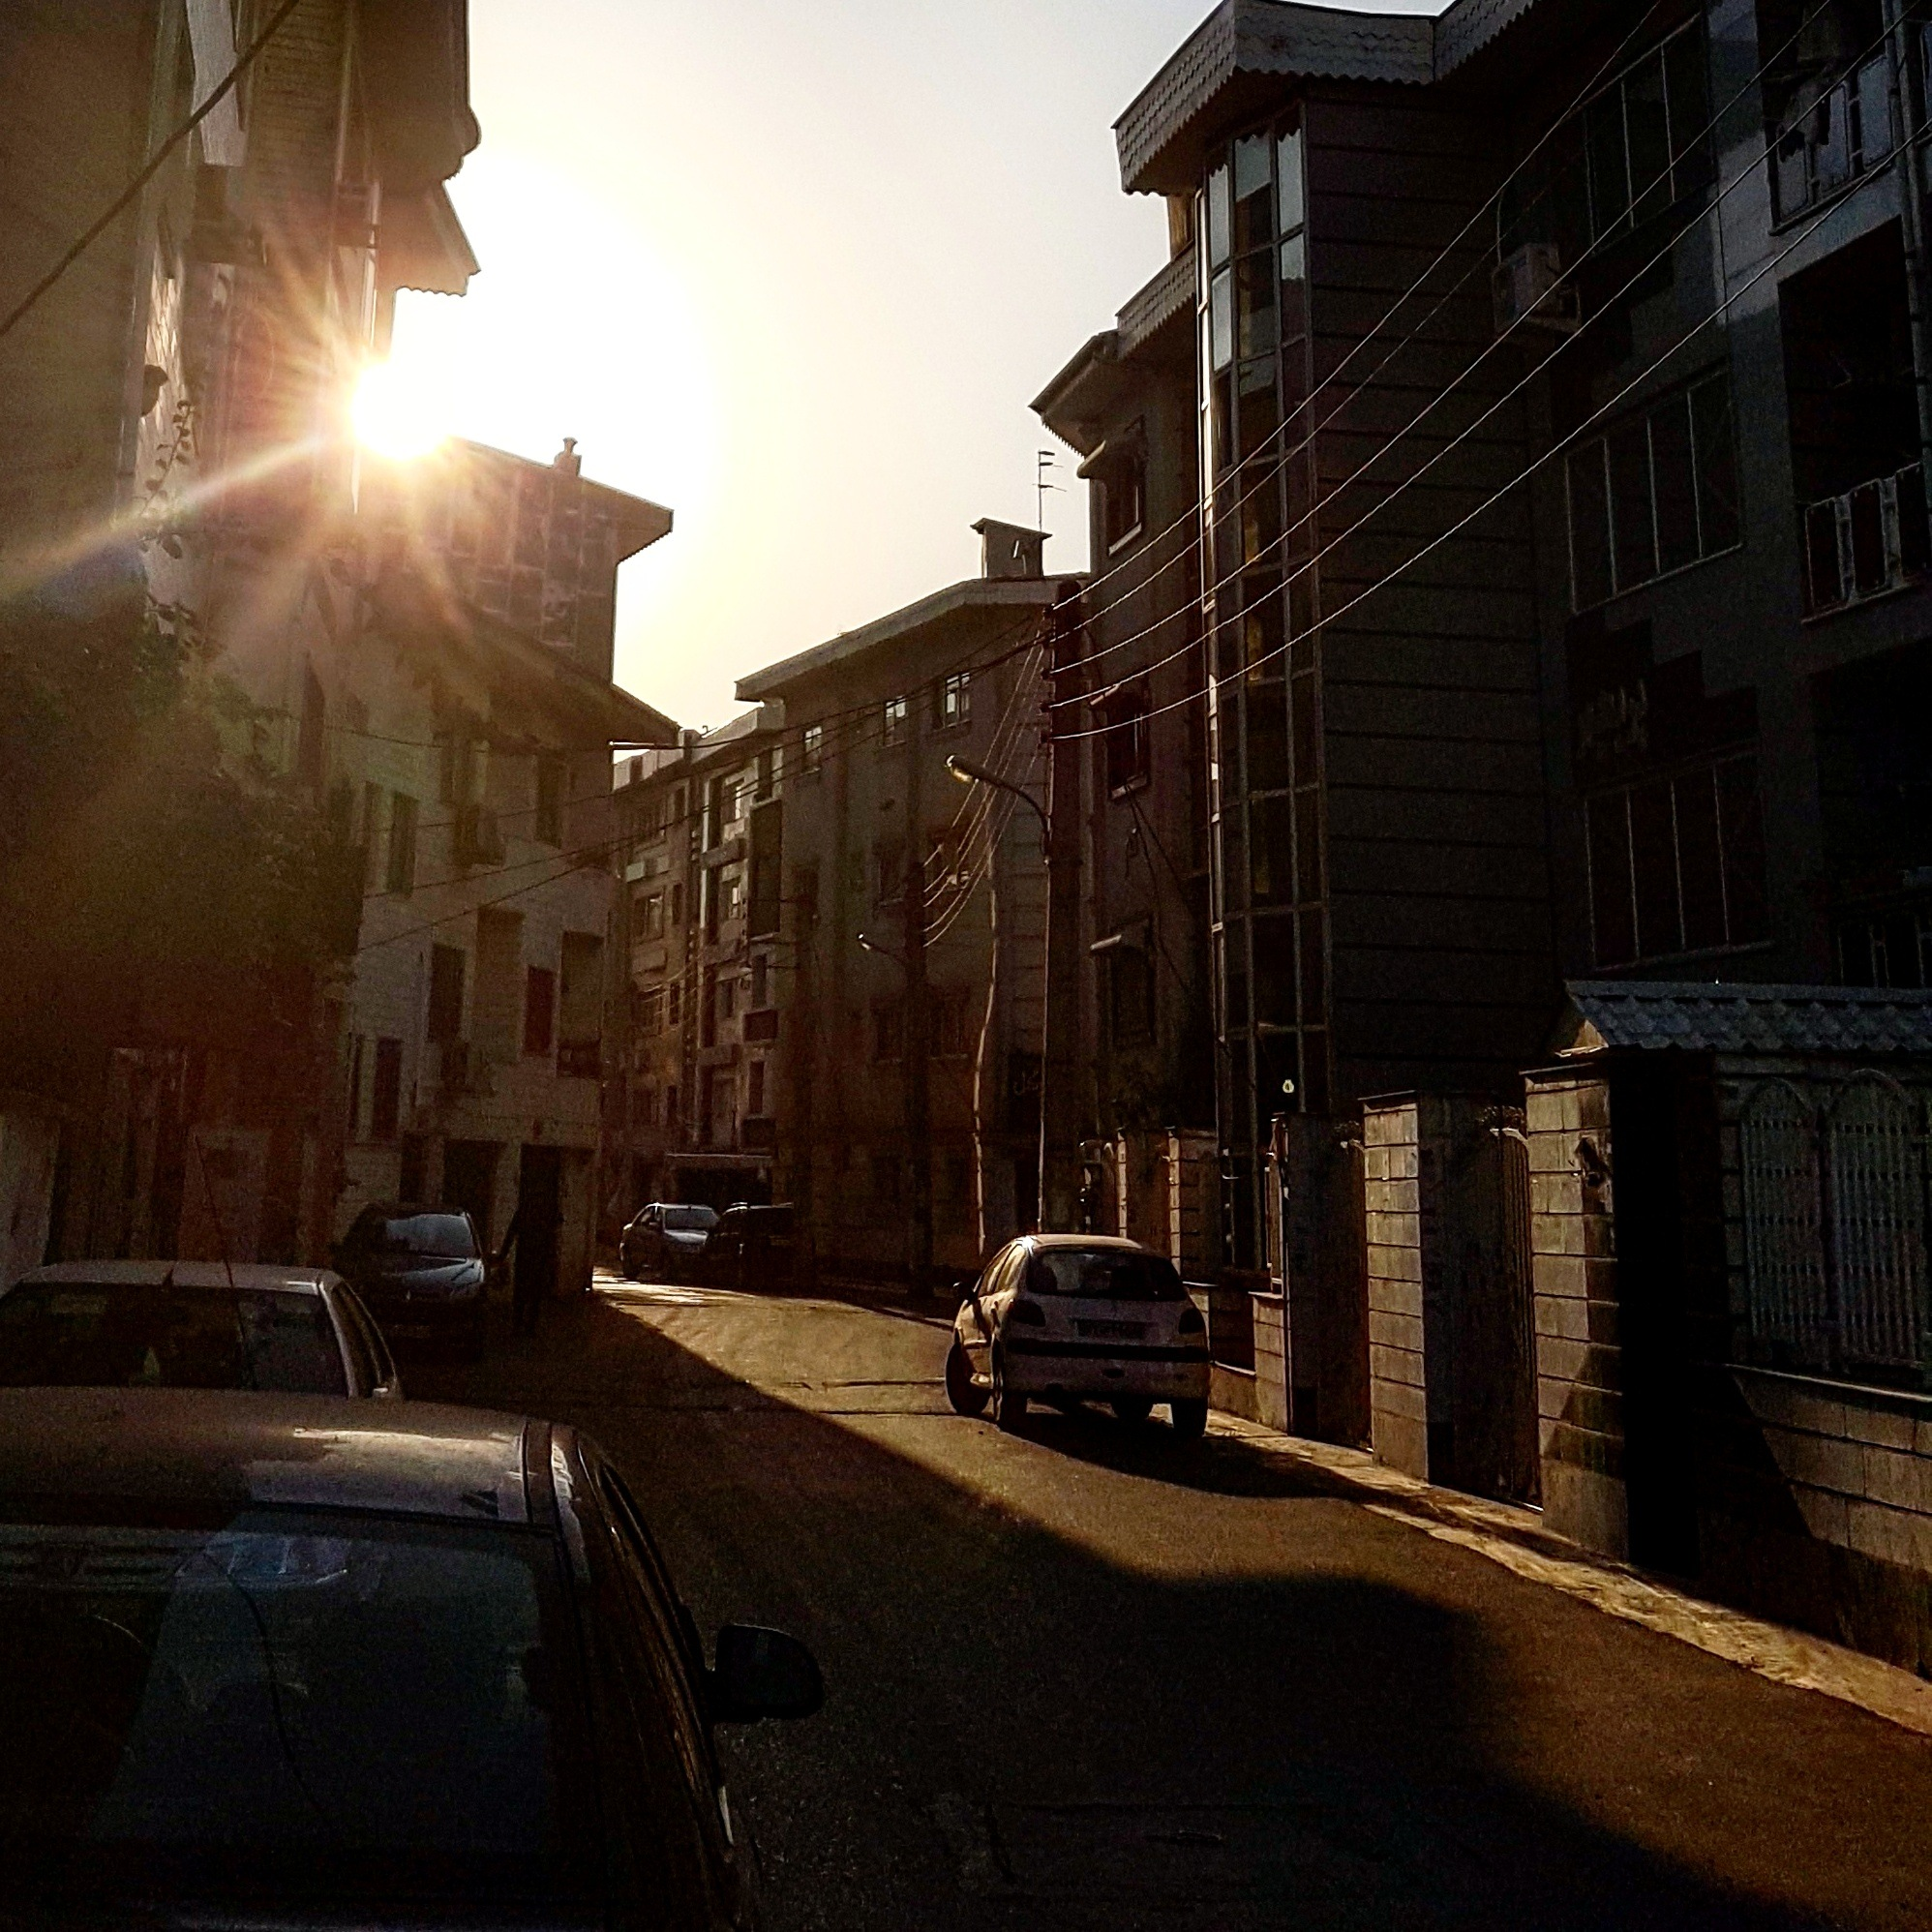 Summer by taherikambiz